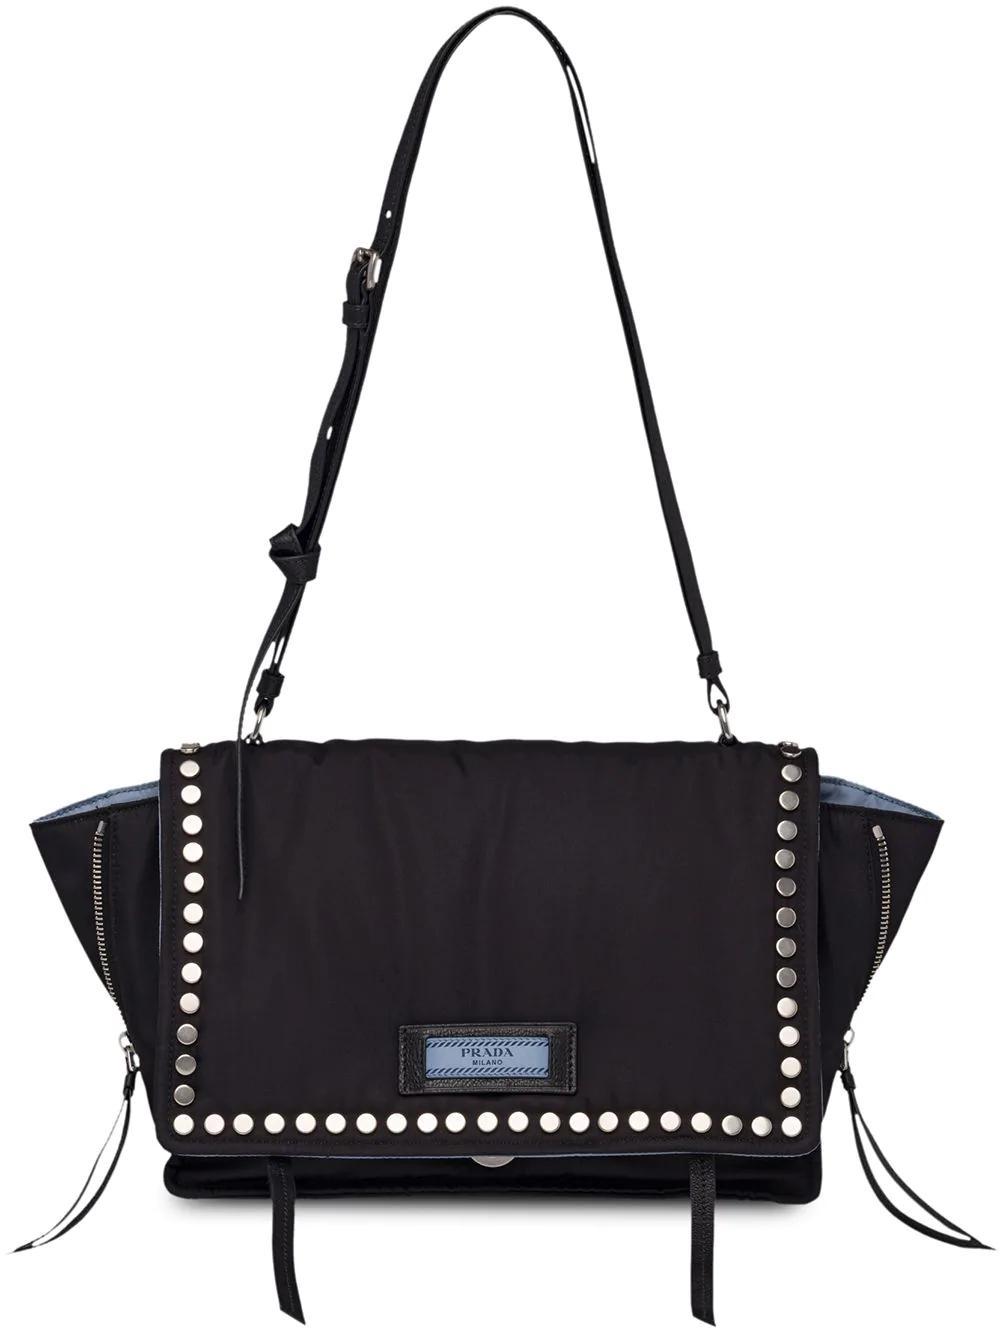 9f92fcb997d0 Prada Stud-Embellished Nylon Cross-Body Bag In Black | ModeSens